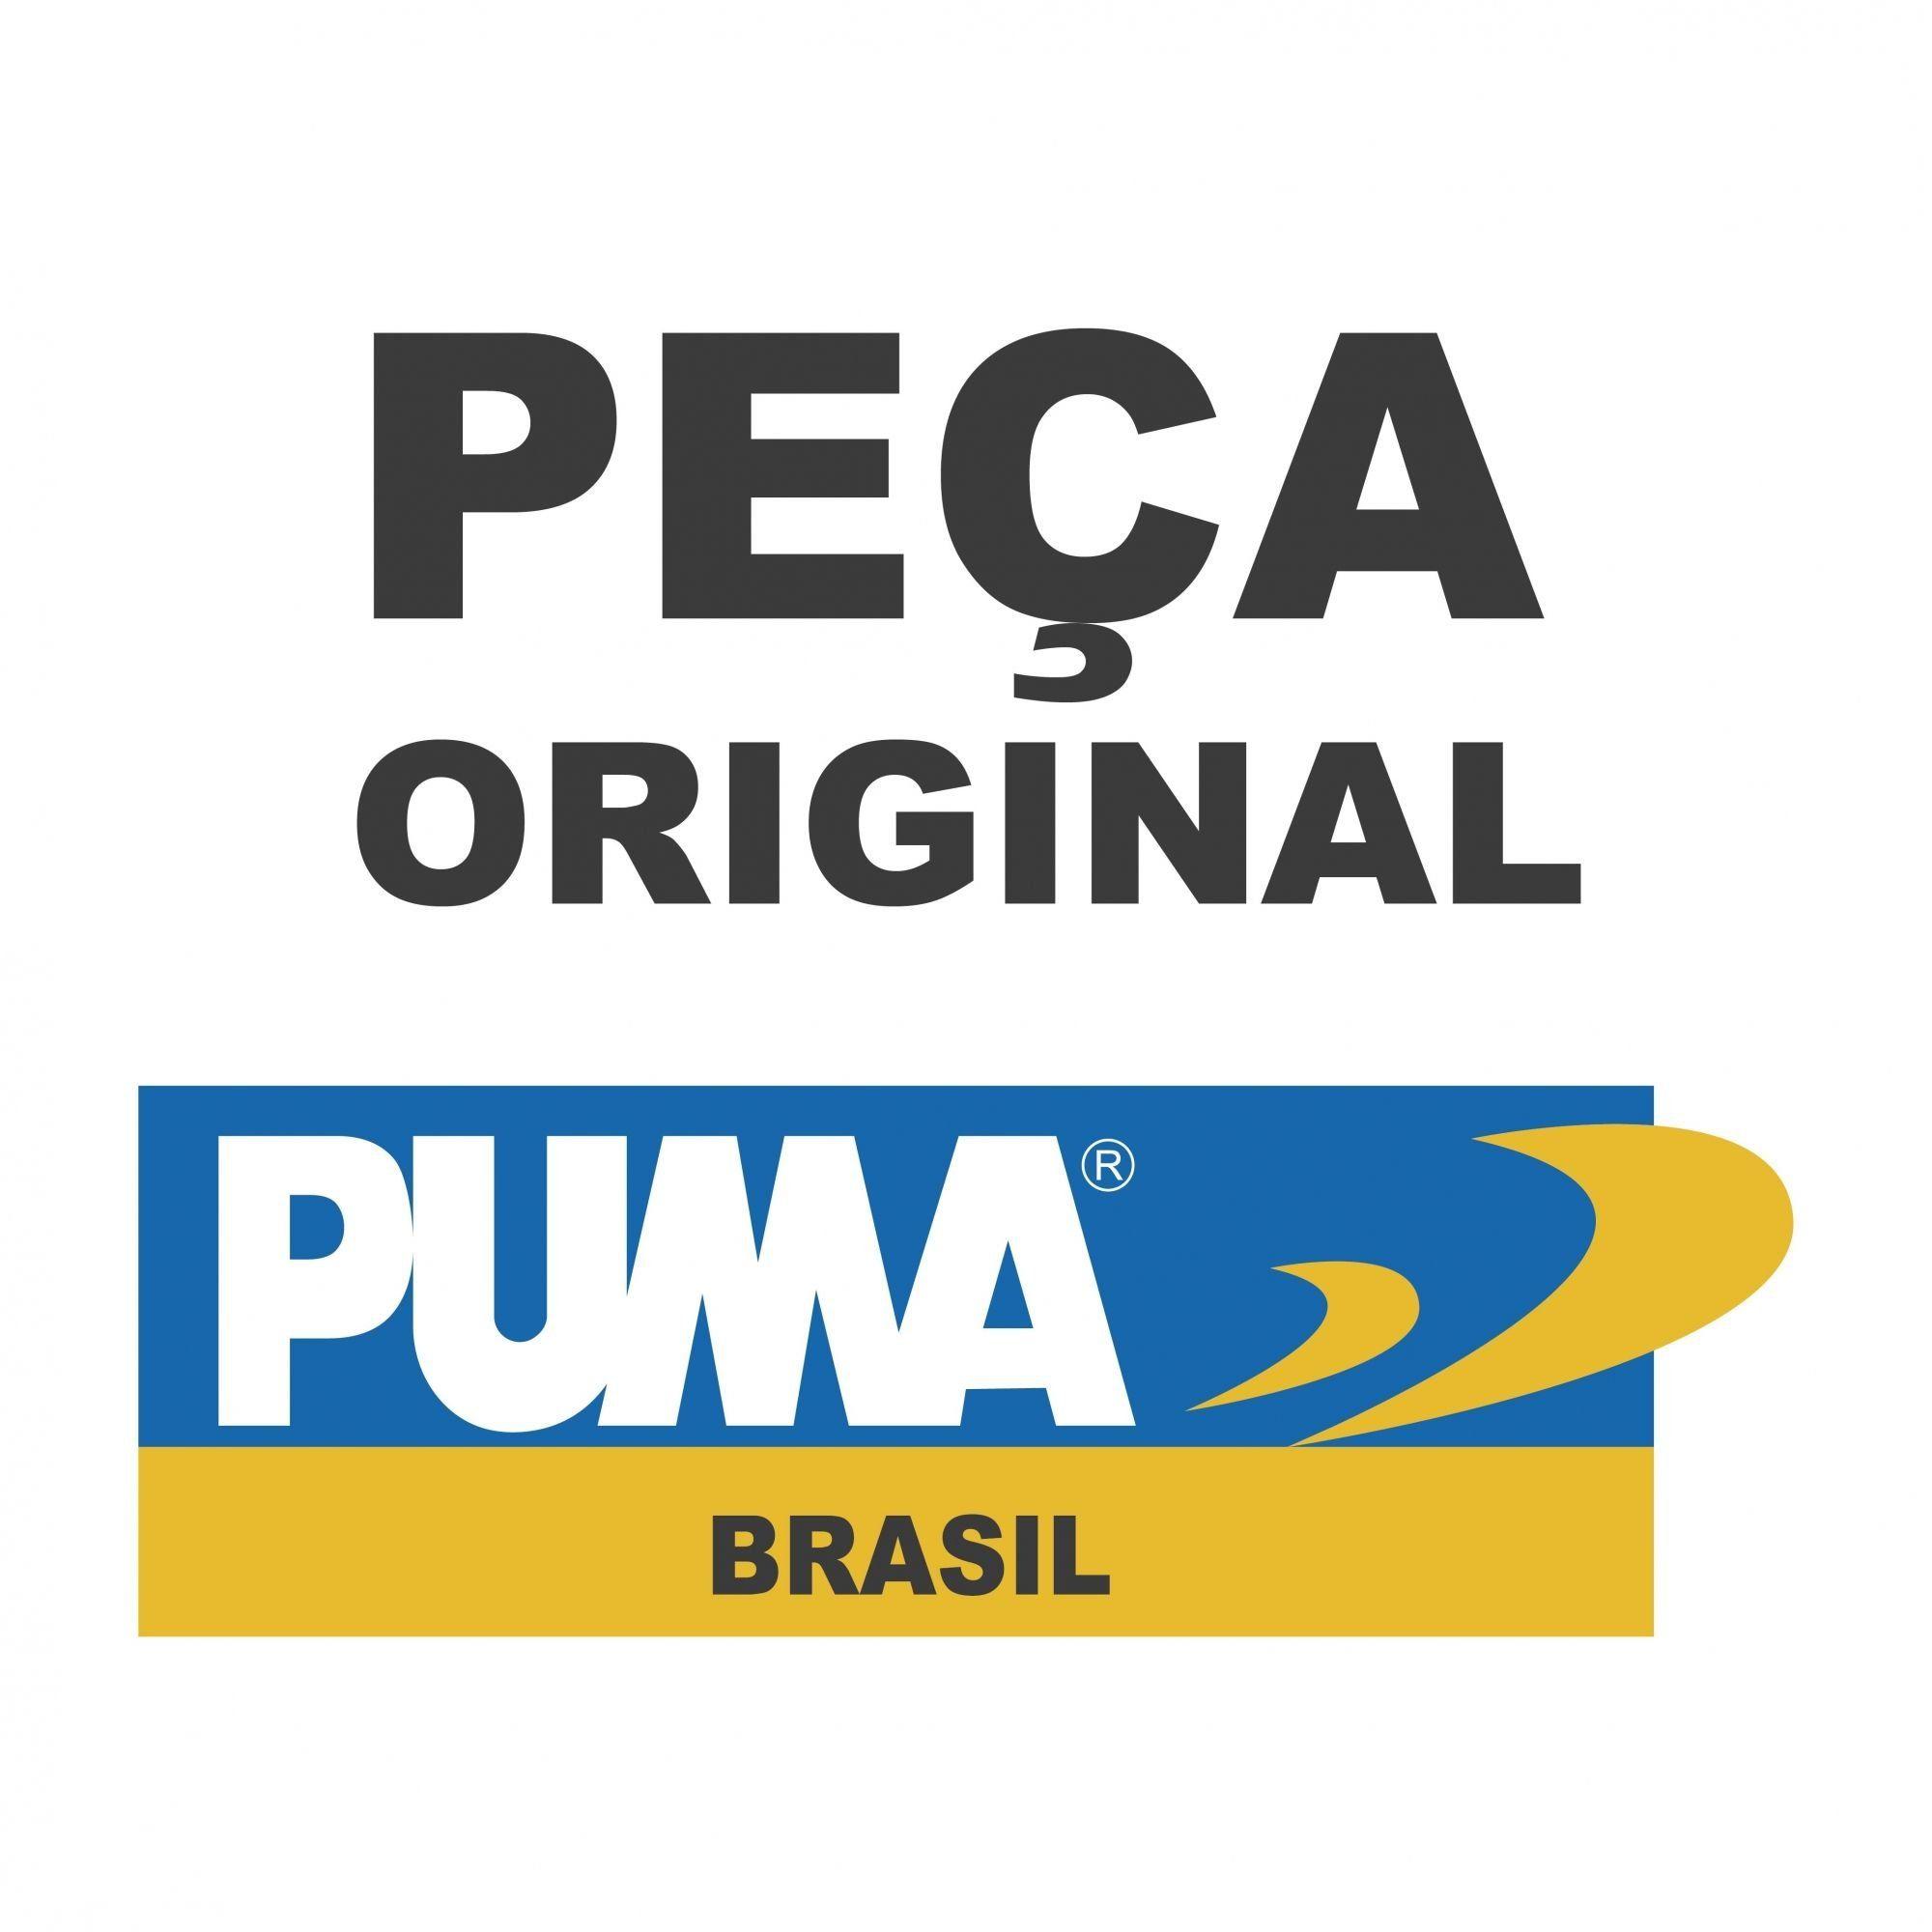 AGULHA DE PINTURA 2.2MM - PEÇA PNEUMÁTICA PUMA - 162A-11D